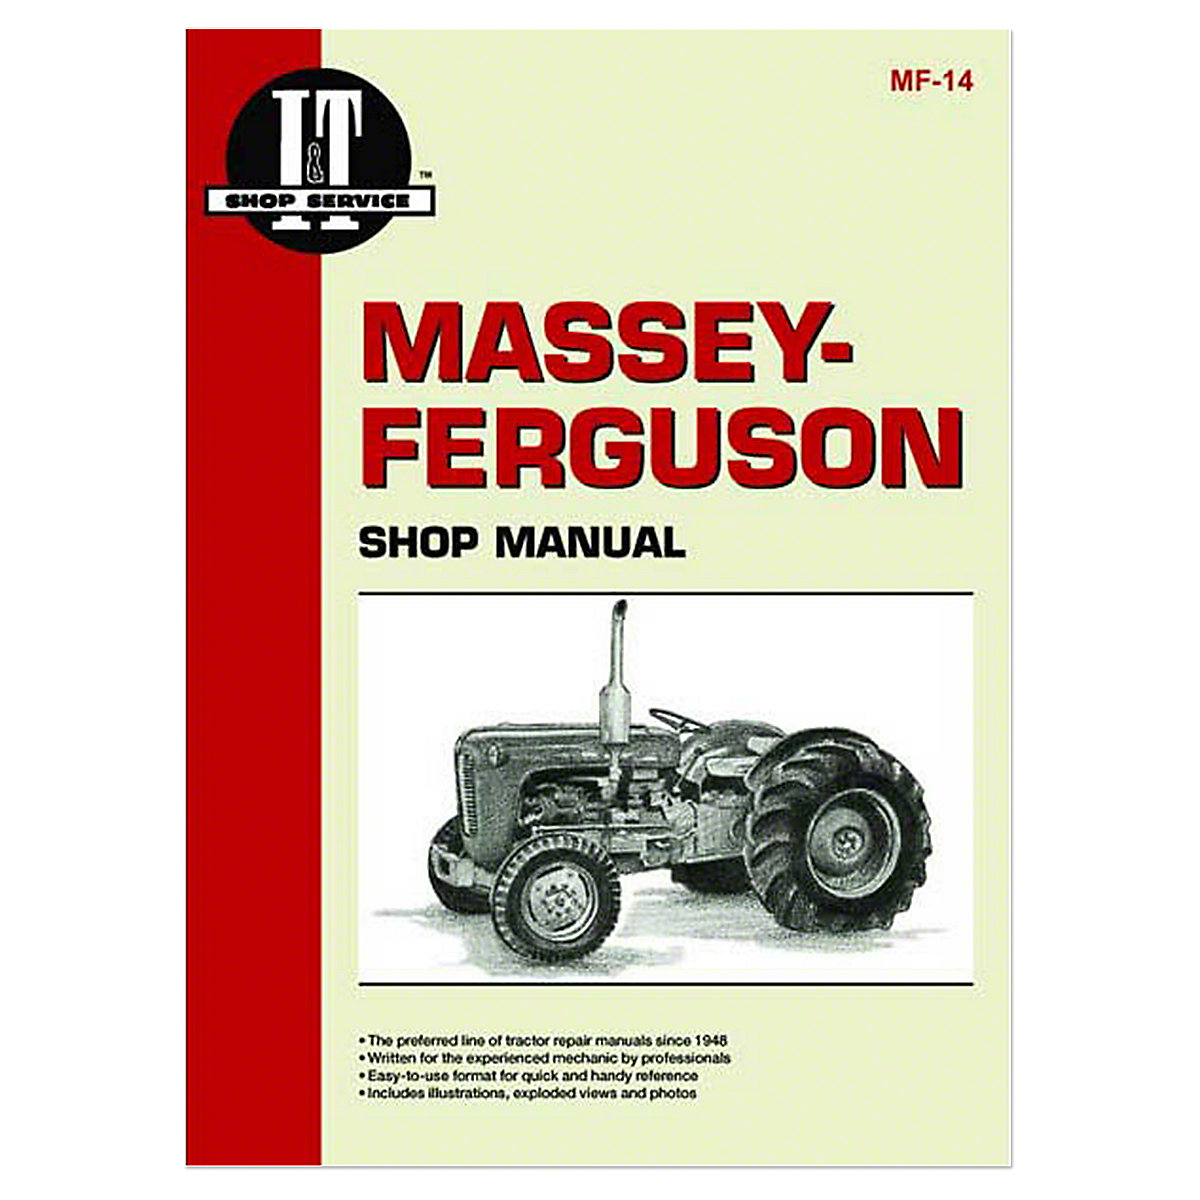 mf14 i t shop service manual rh steinertractor com Tractor Manual Thickness Ford Tractor Manuals